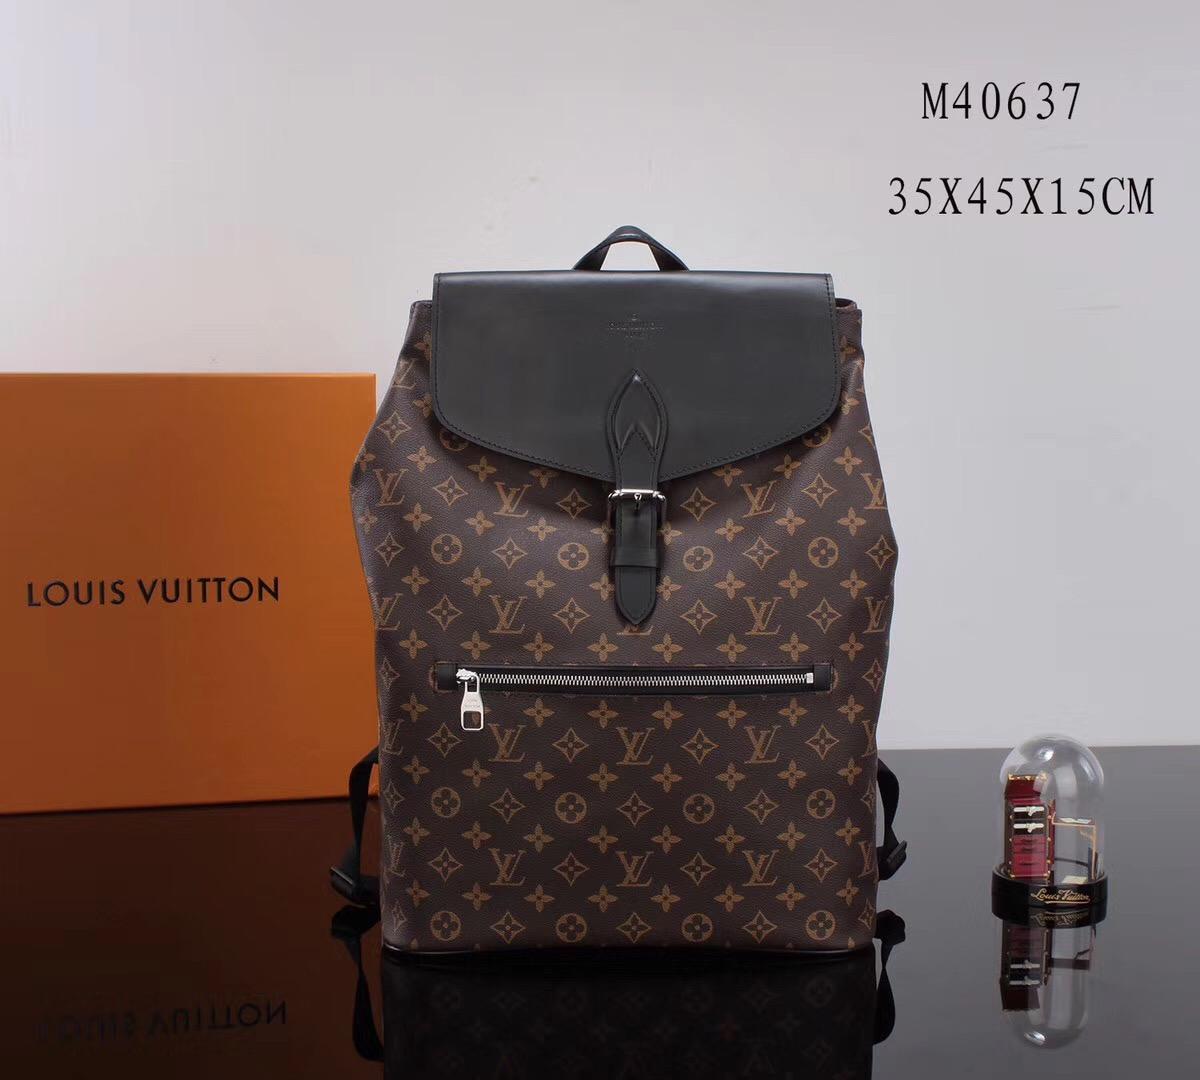 077df3228a45 LV Louis Vuitton Palk M40637 Backpack bags Monogram Handbags